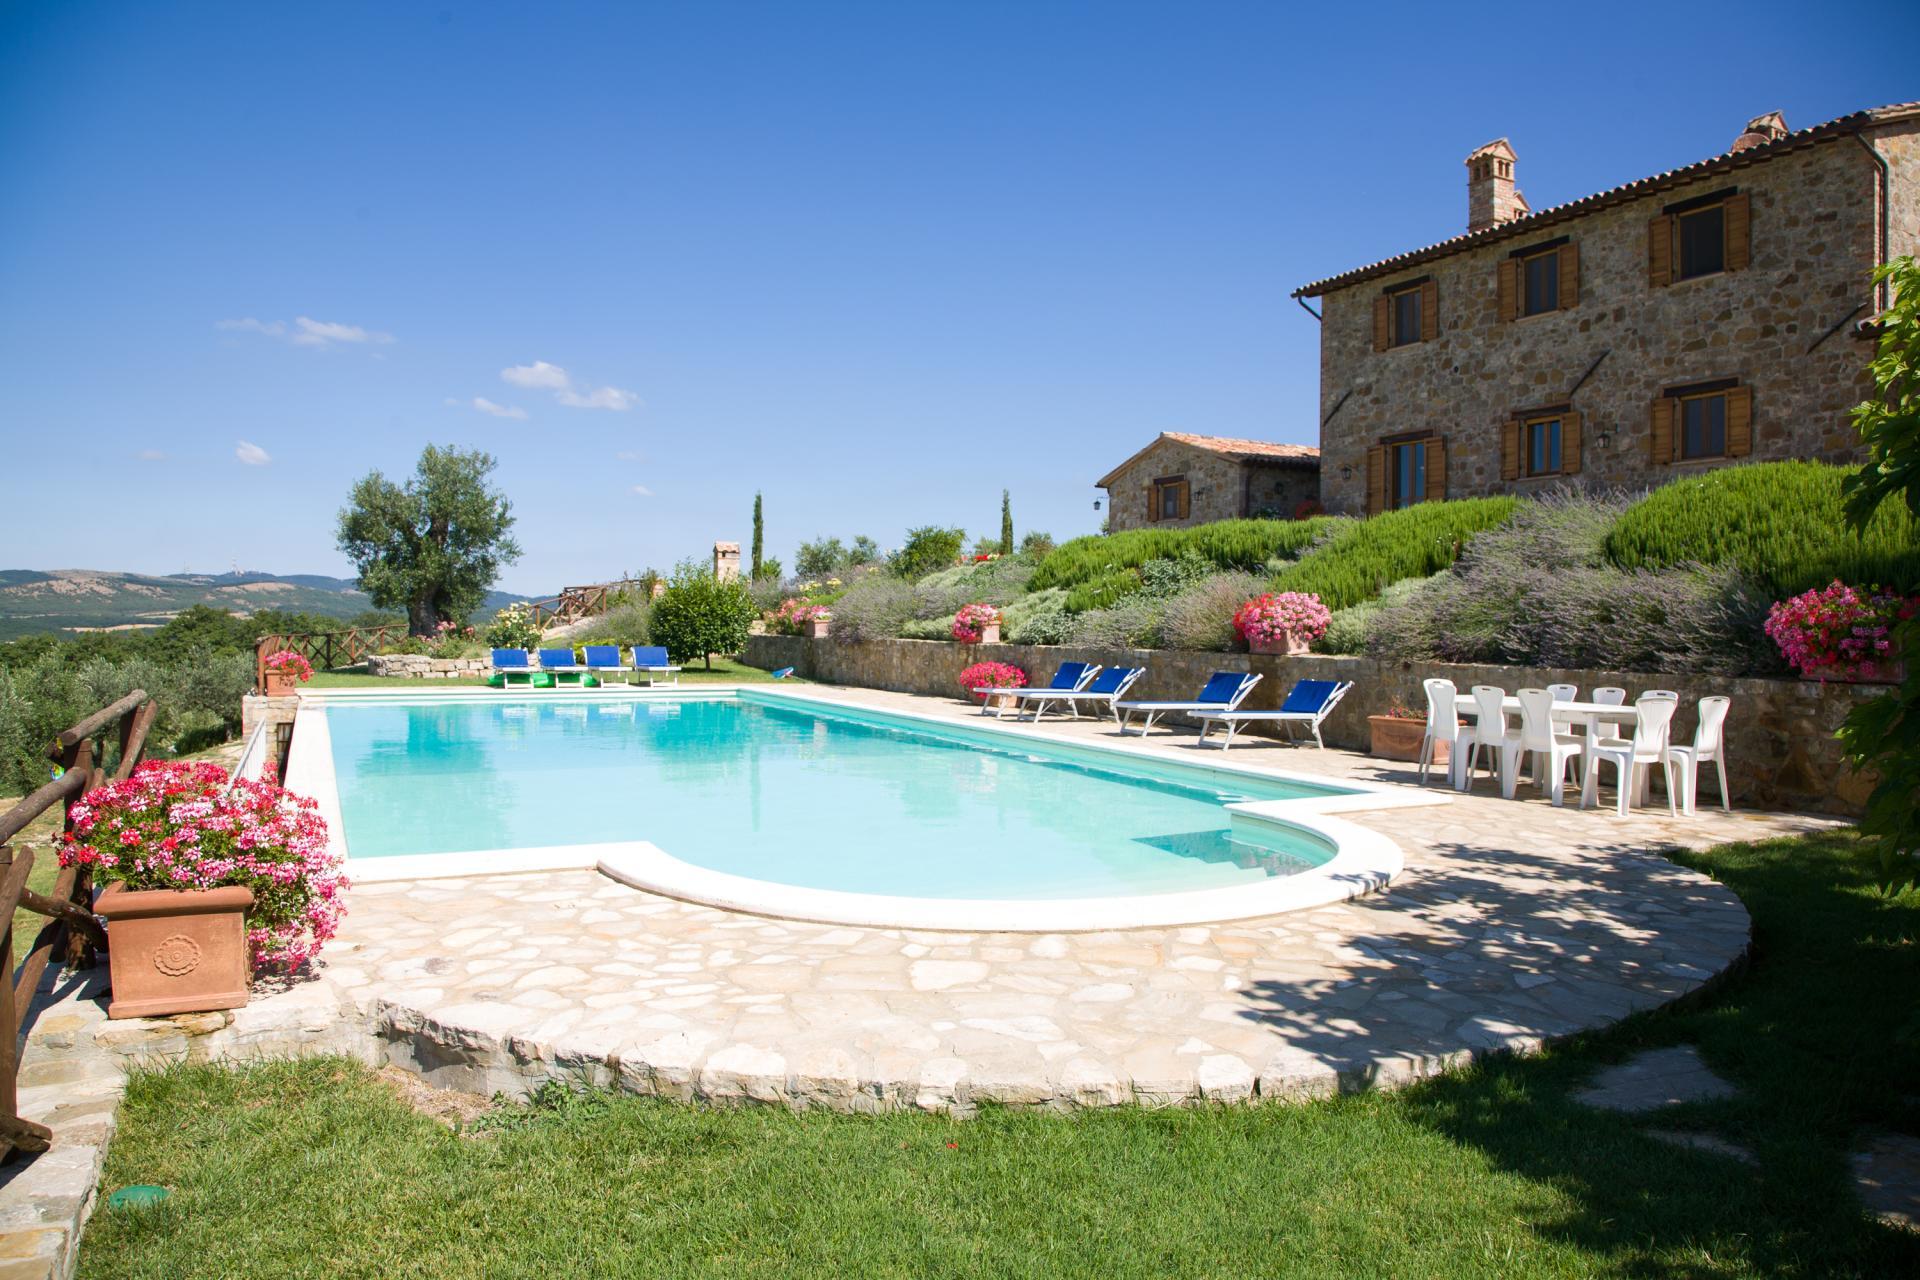 Outdoor Pool 2, Domus Romana, Todi, Umbria.